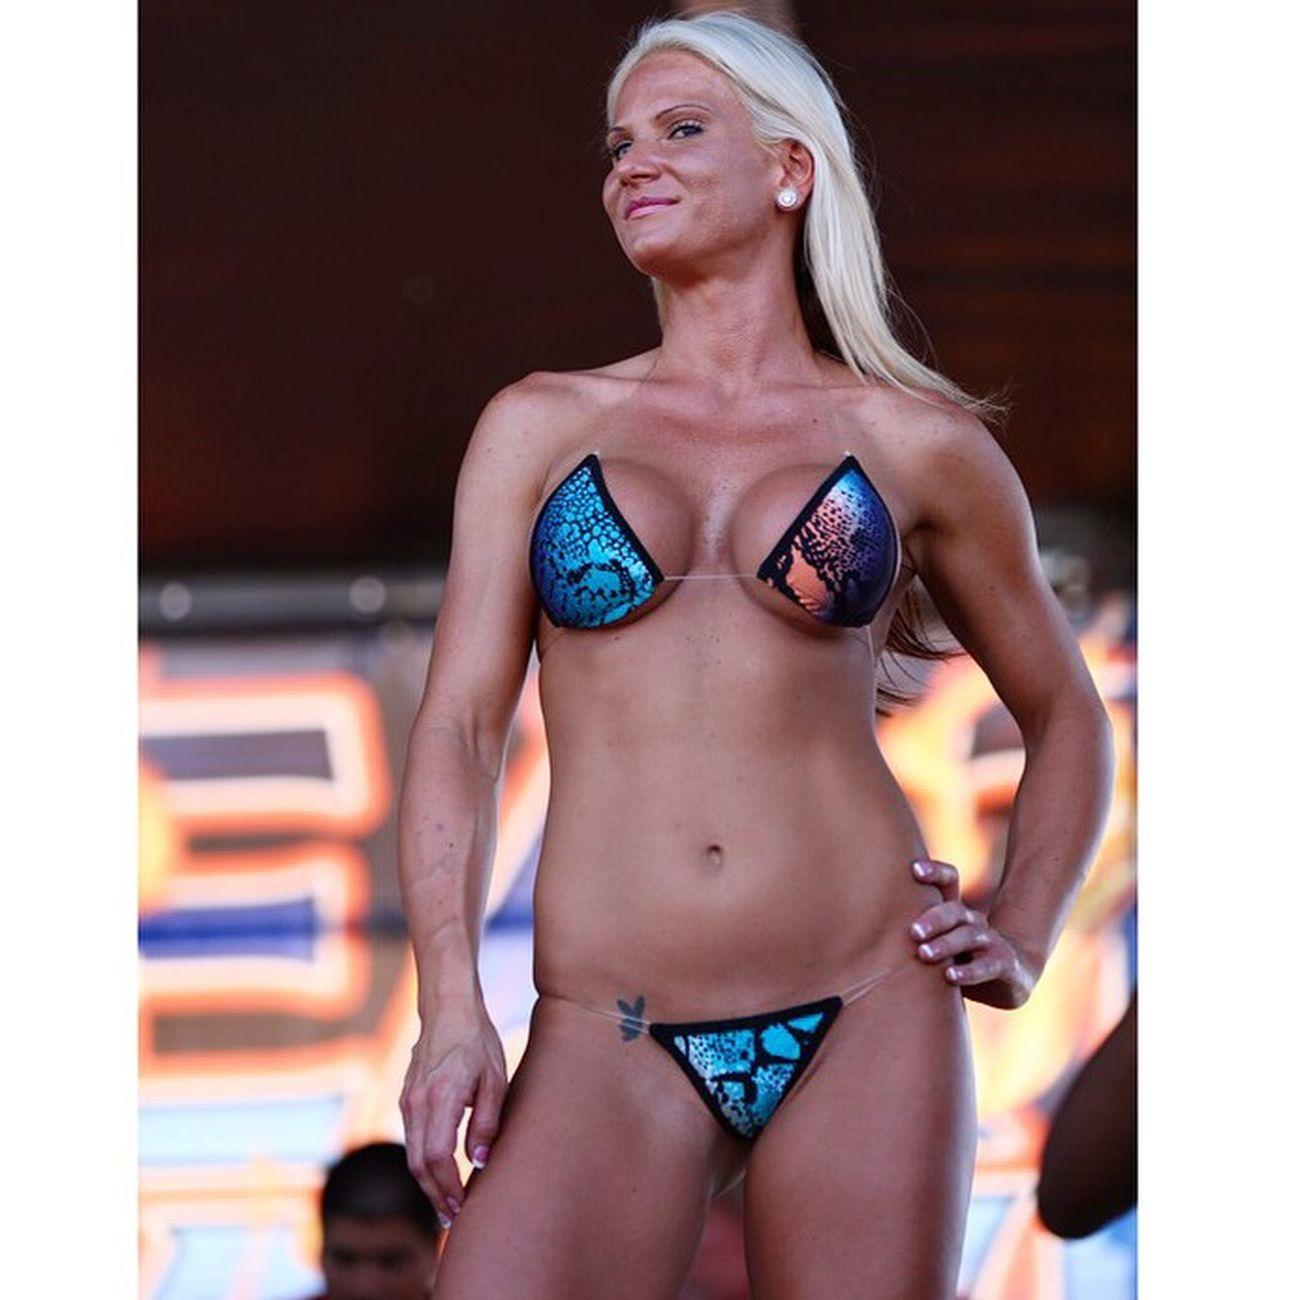 Bikini Texasheatwave2014 Austin Texas Bikinicontest